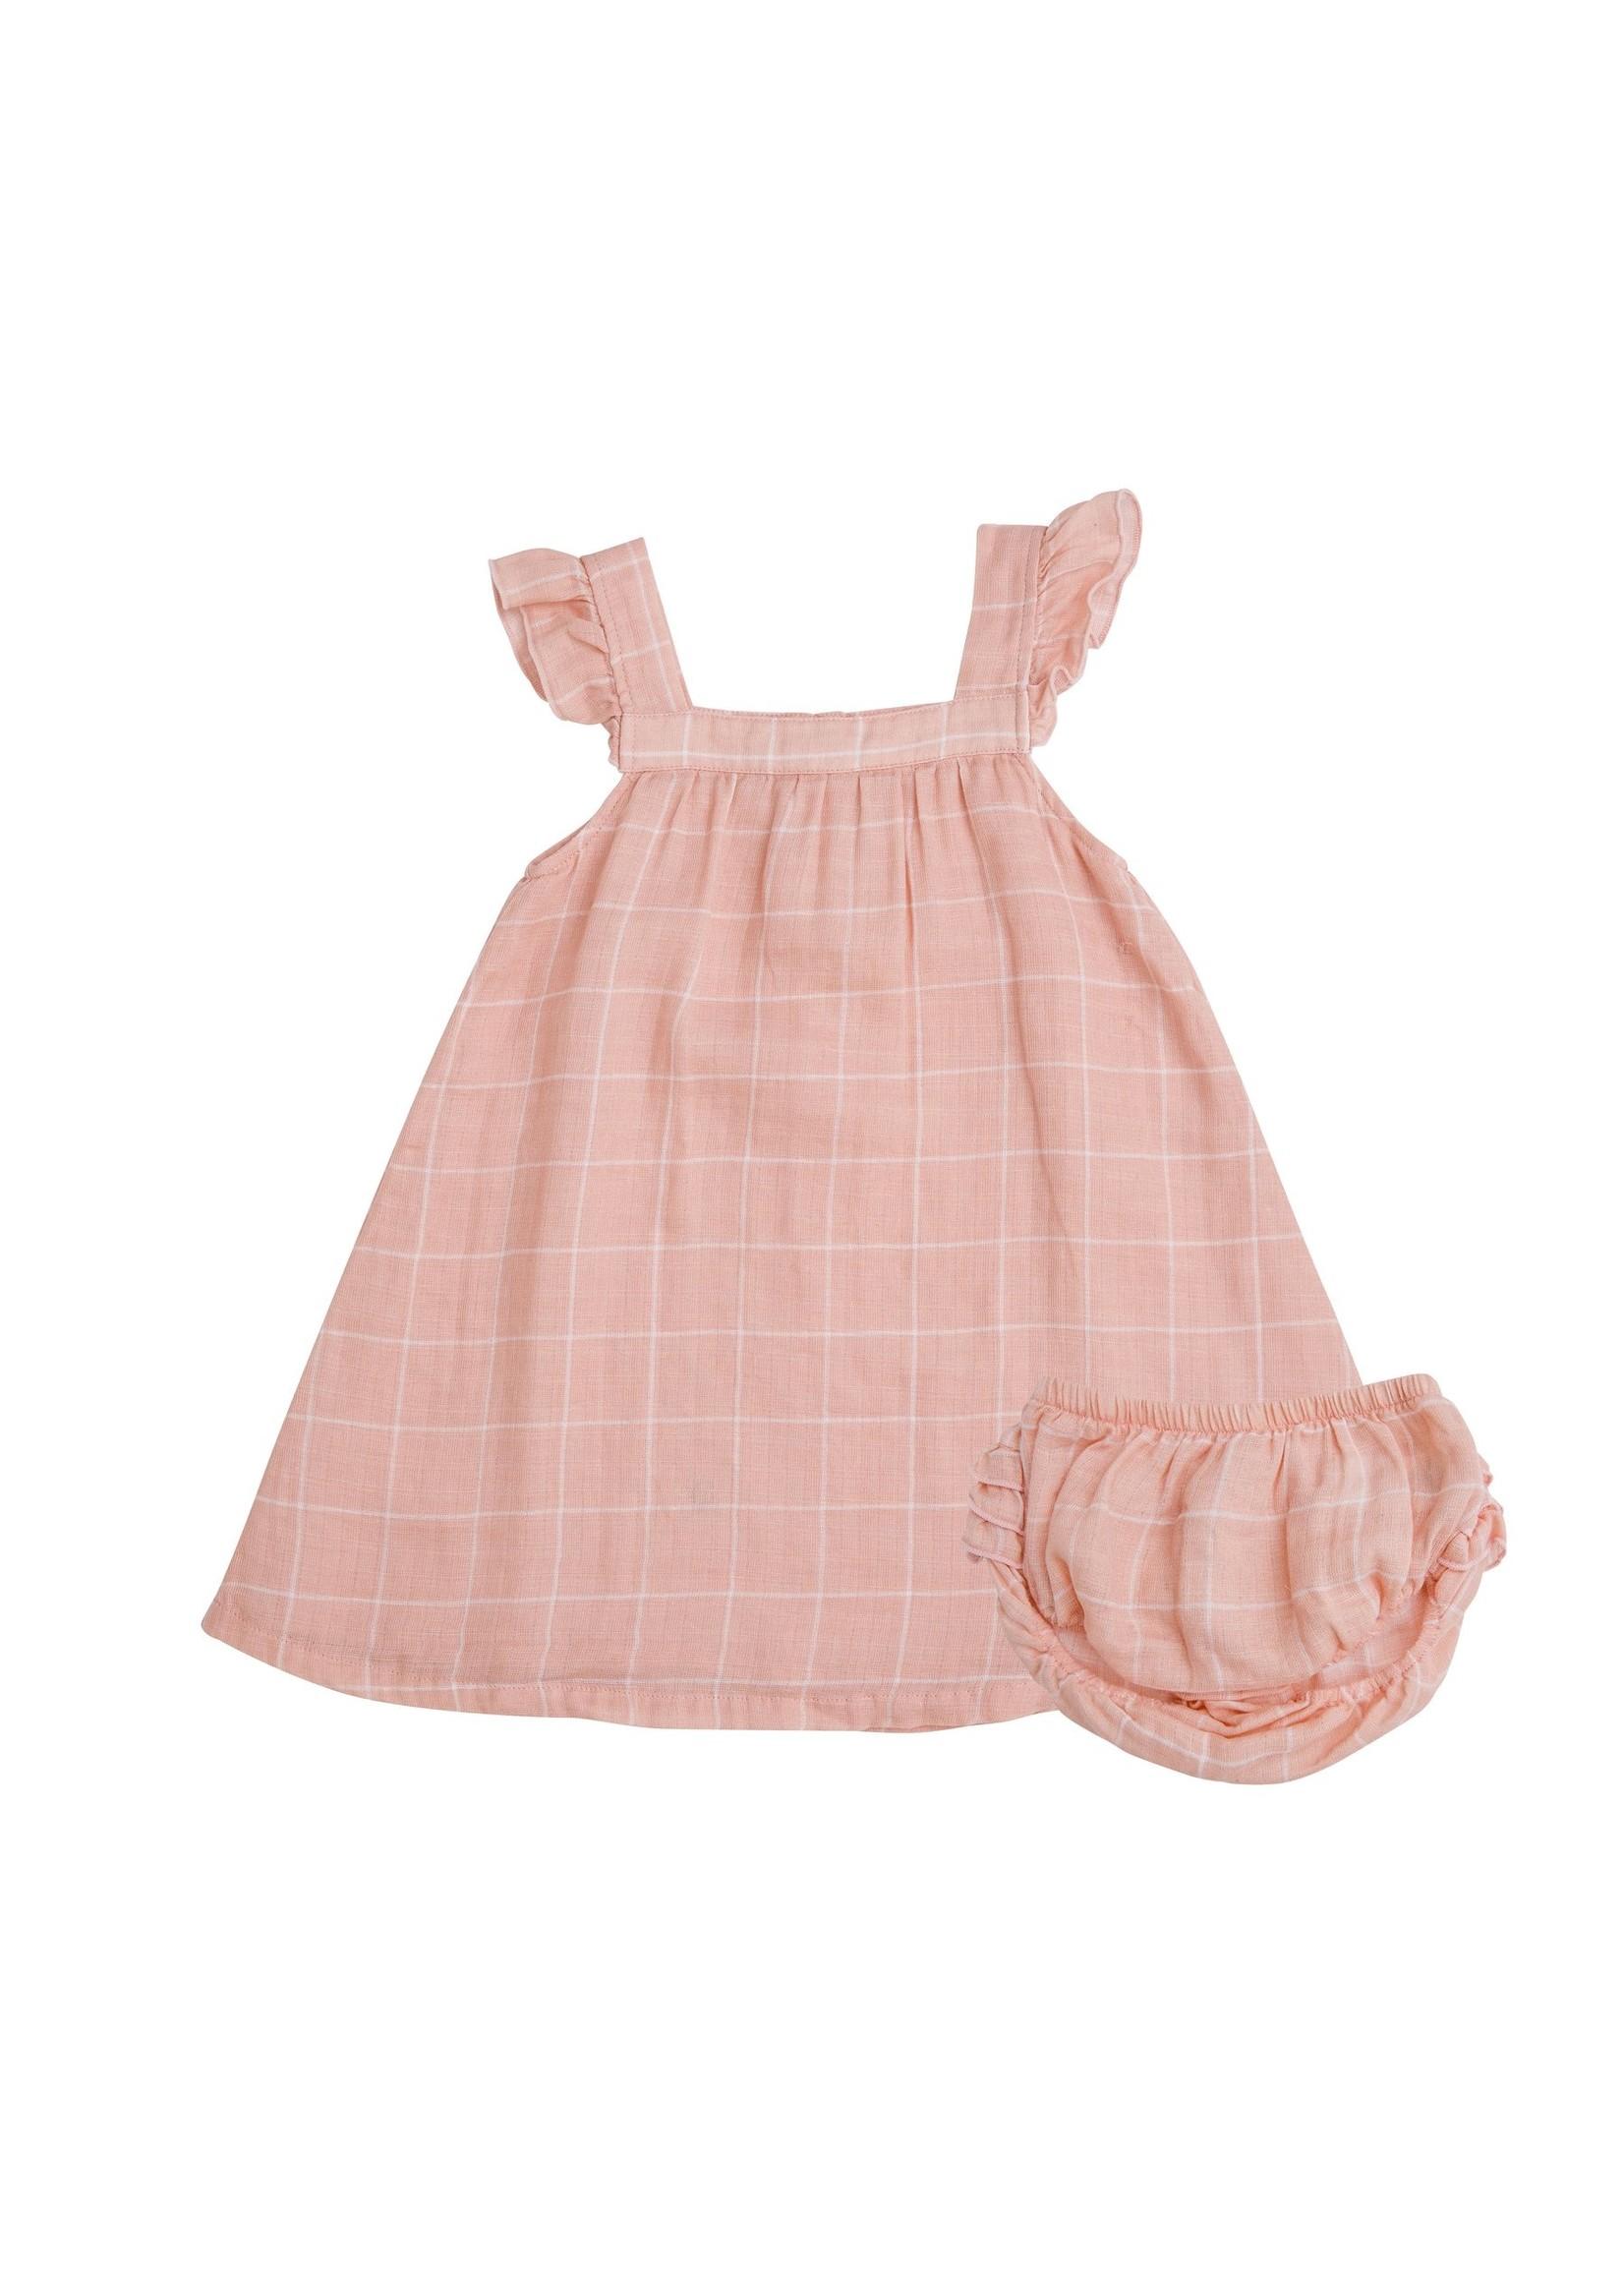 Angel Dear Off Grid Sundress/Diaper Cover Pink